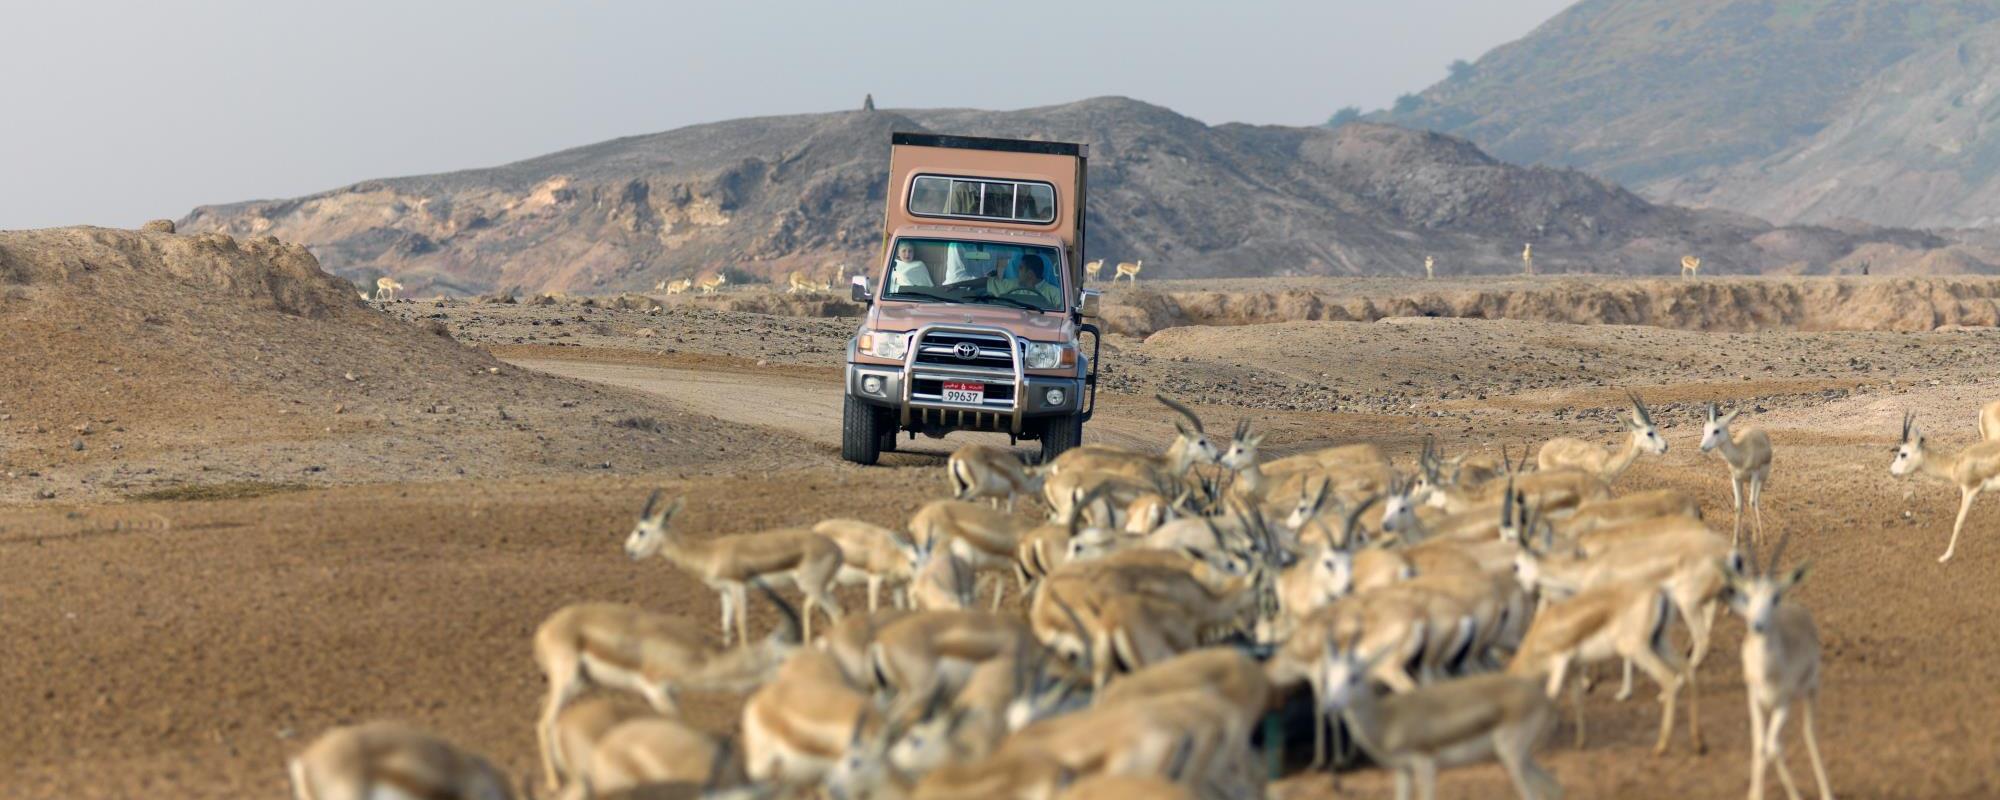 Arabian Wildlife Park In Sir Bani Yas Island